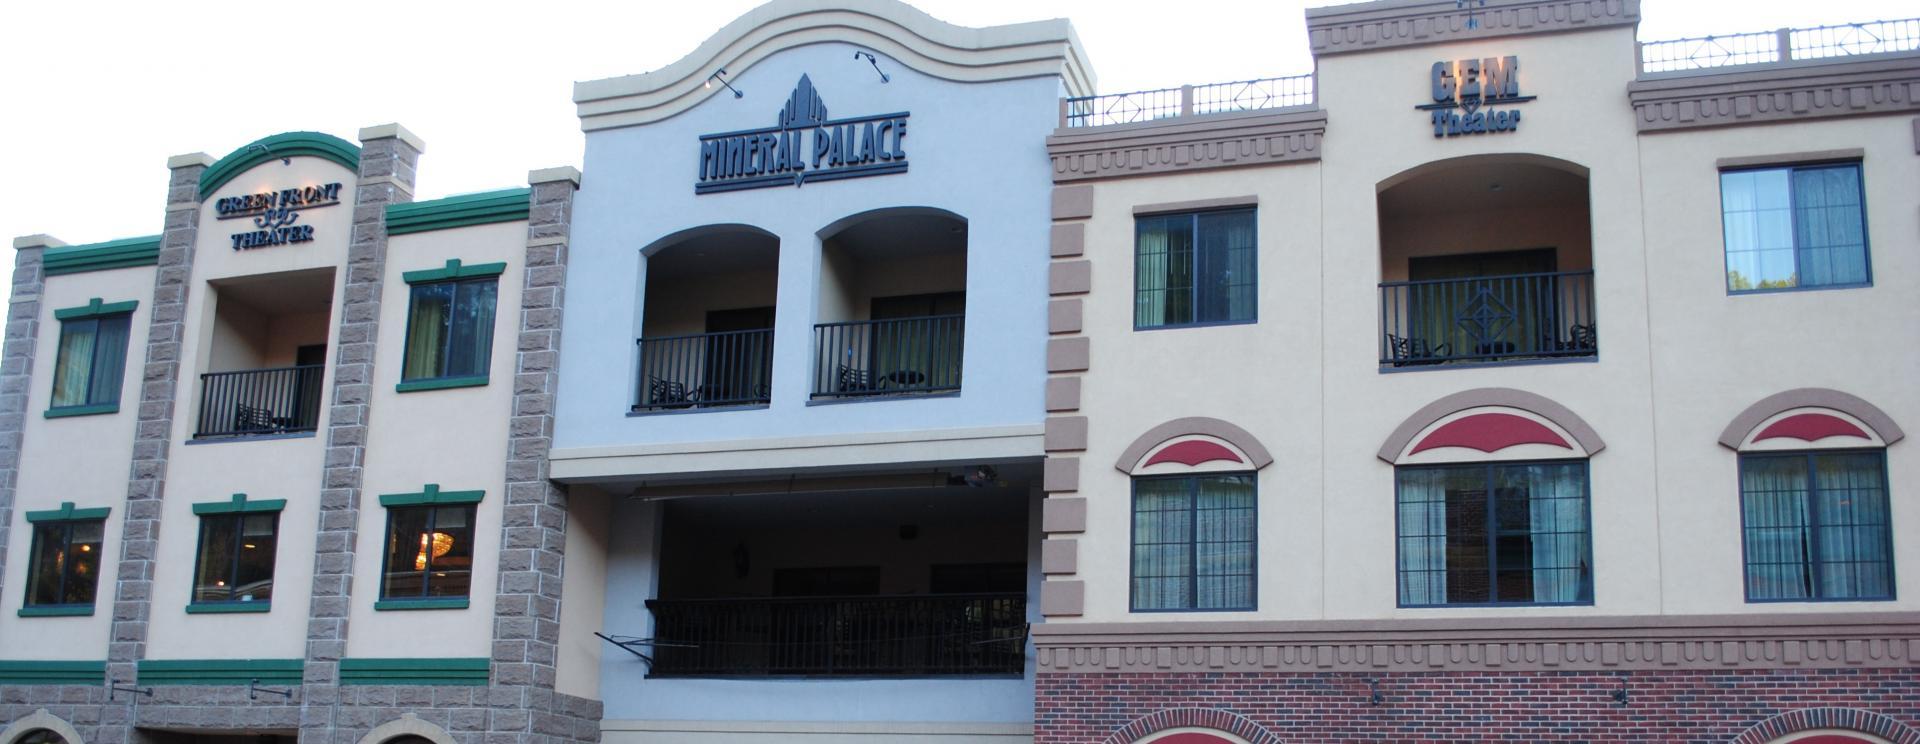 Mineral Palace Hotel & Gaming